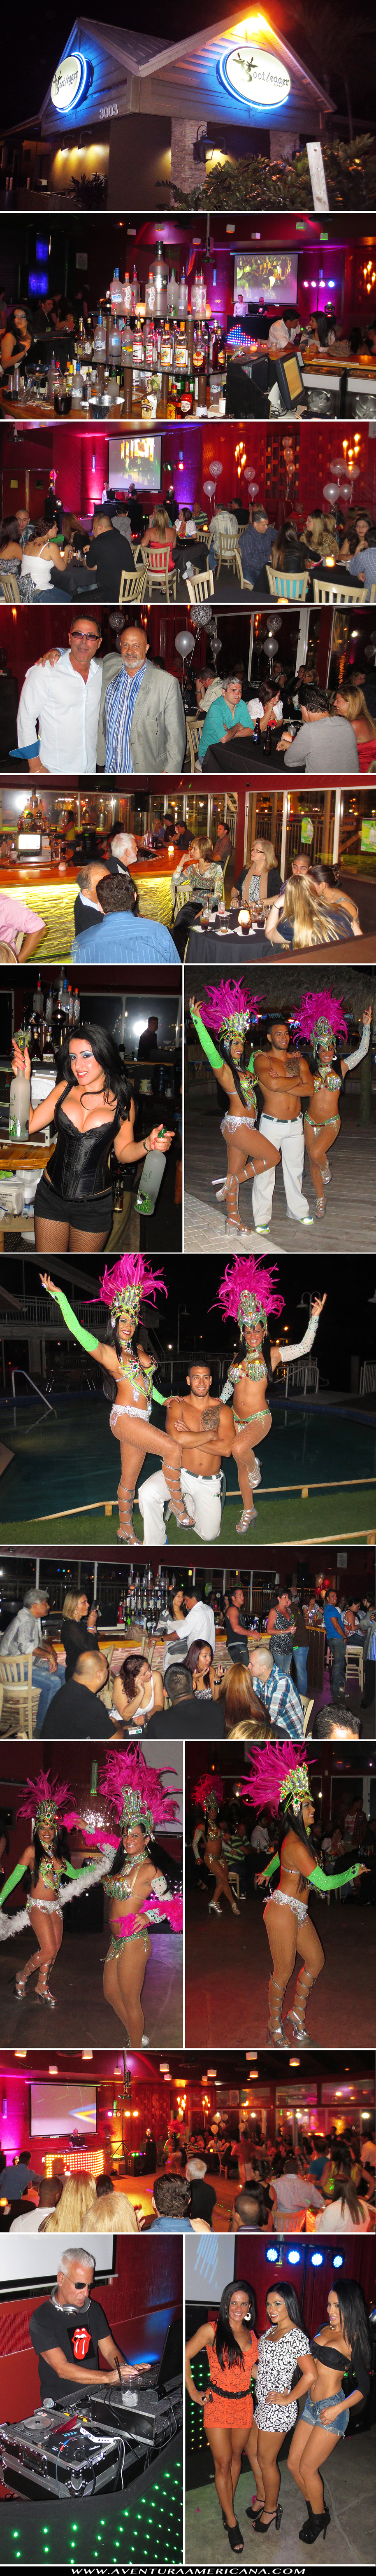 Brazil Night